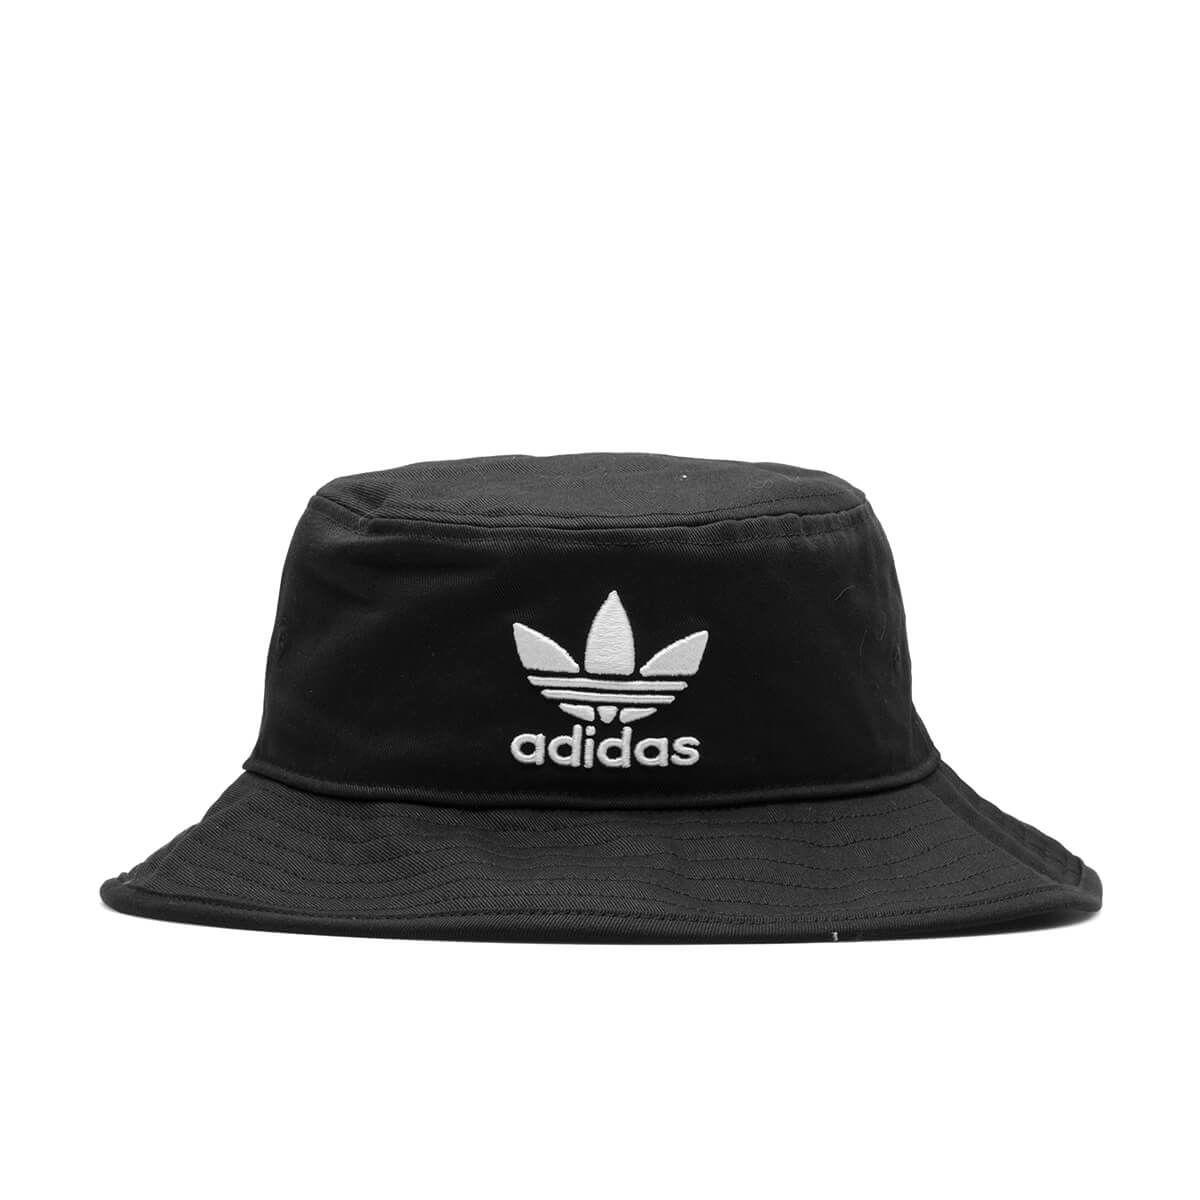 Adidas Originals Hats BUCKET HAT